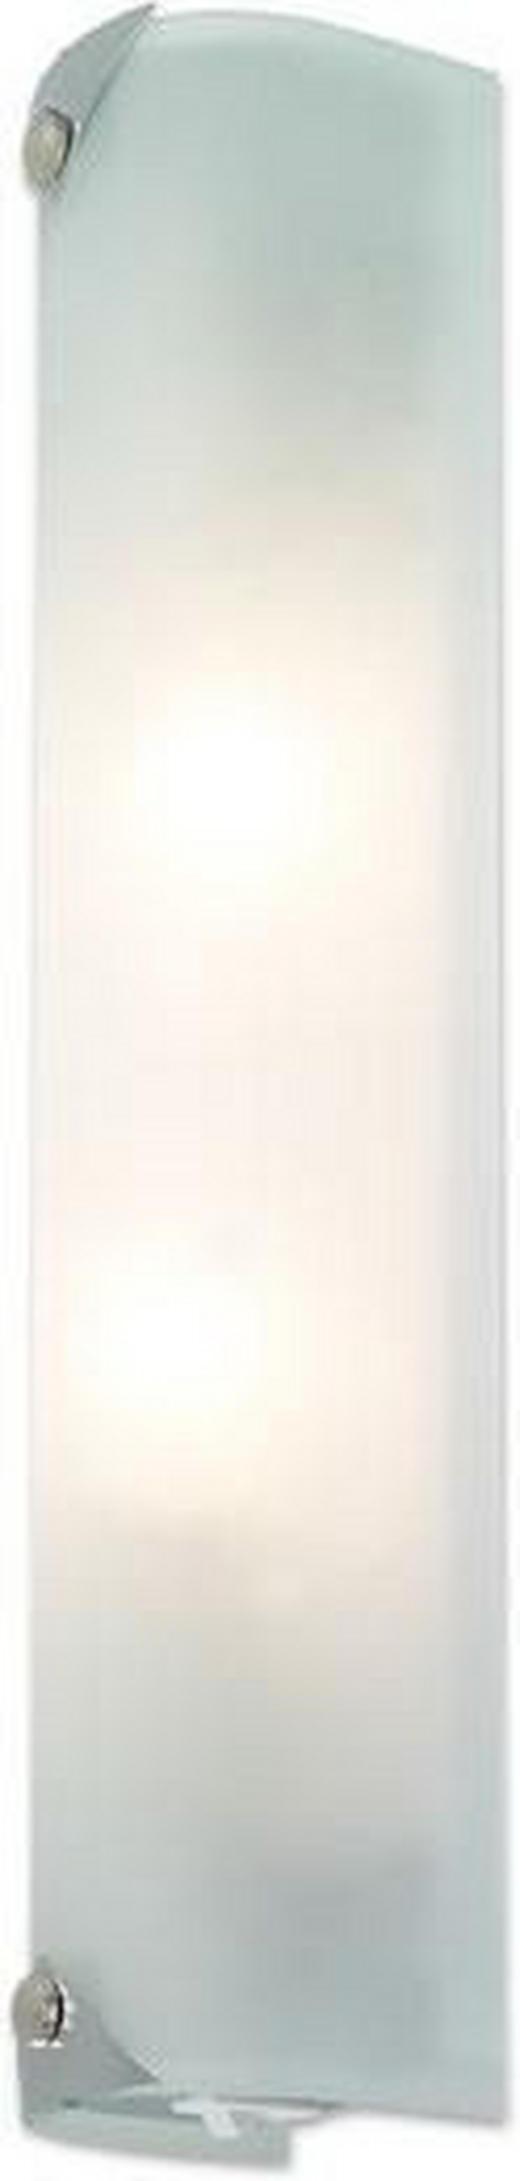 WANDLEUCHTE - Chromfarben/Weiß, Basics, Metall (25cm)